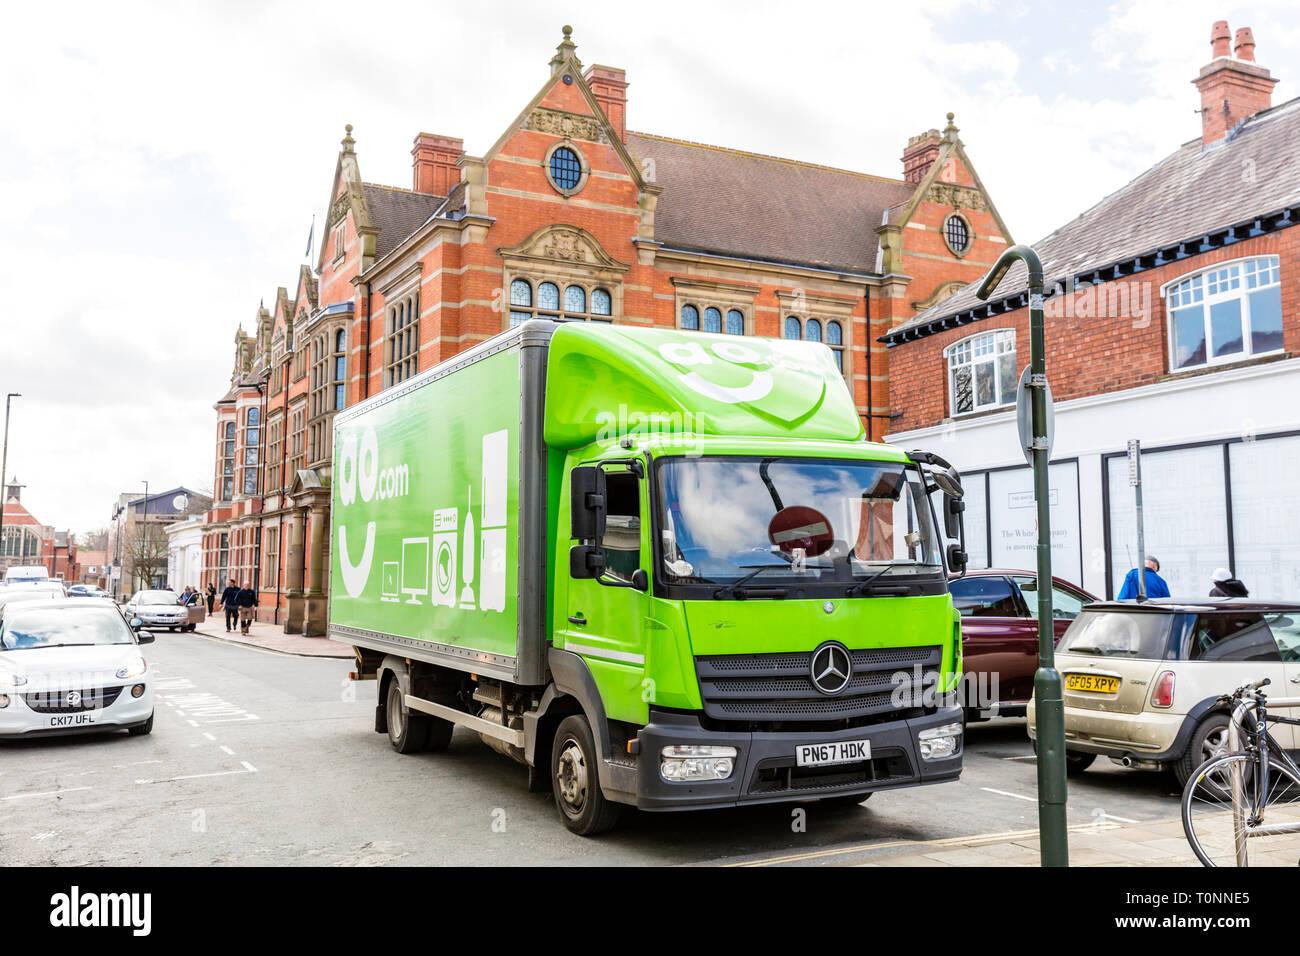 AO delivery, AO.com, Delivering AO appliances, AO delivery truck, AO, delivery, delivering, appliances, lorry, truck, AO electrical, electrical goods, - Stock Image